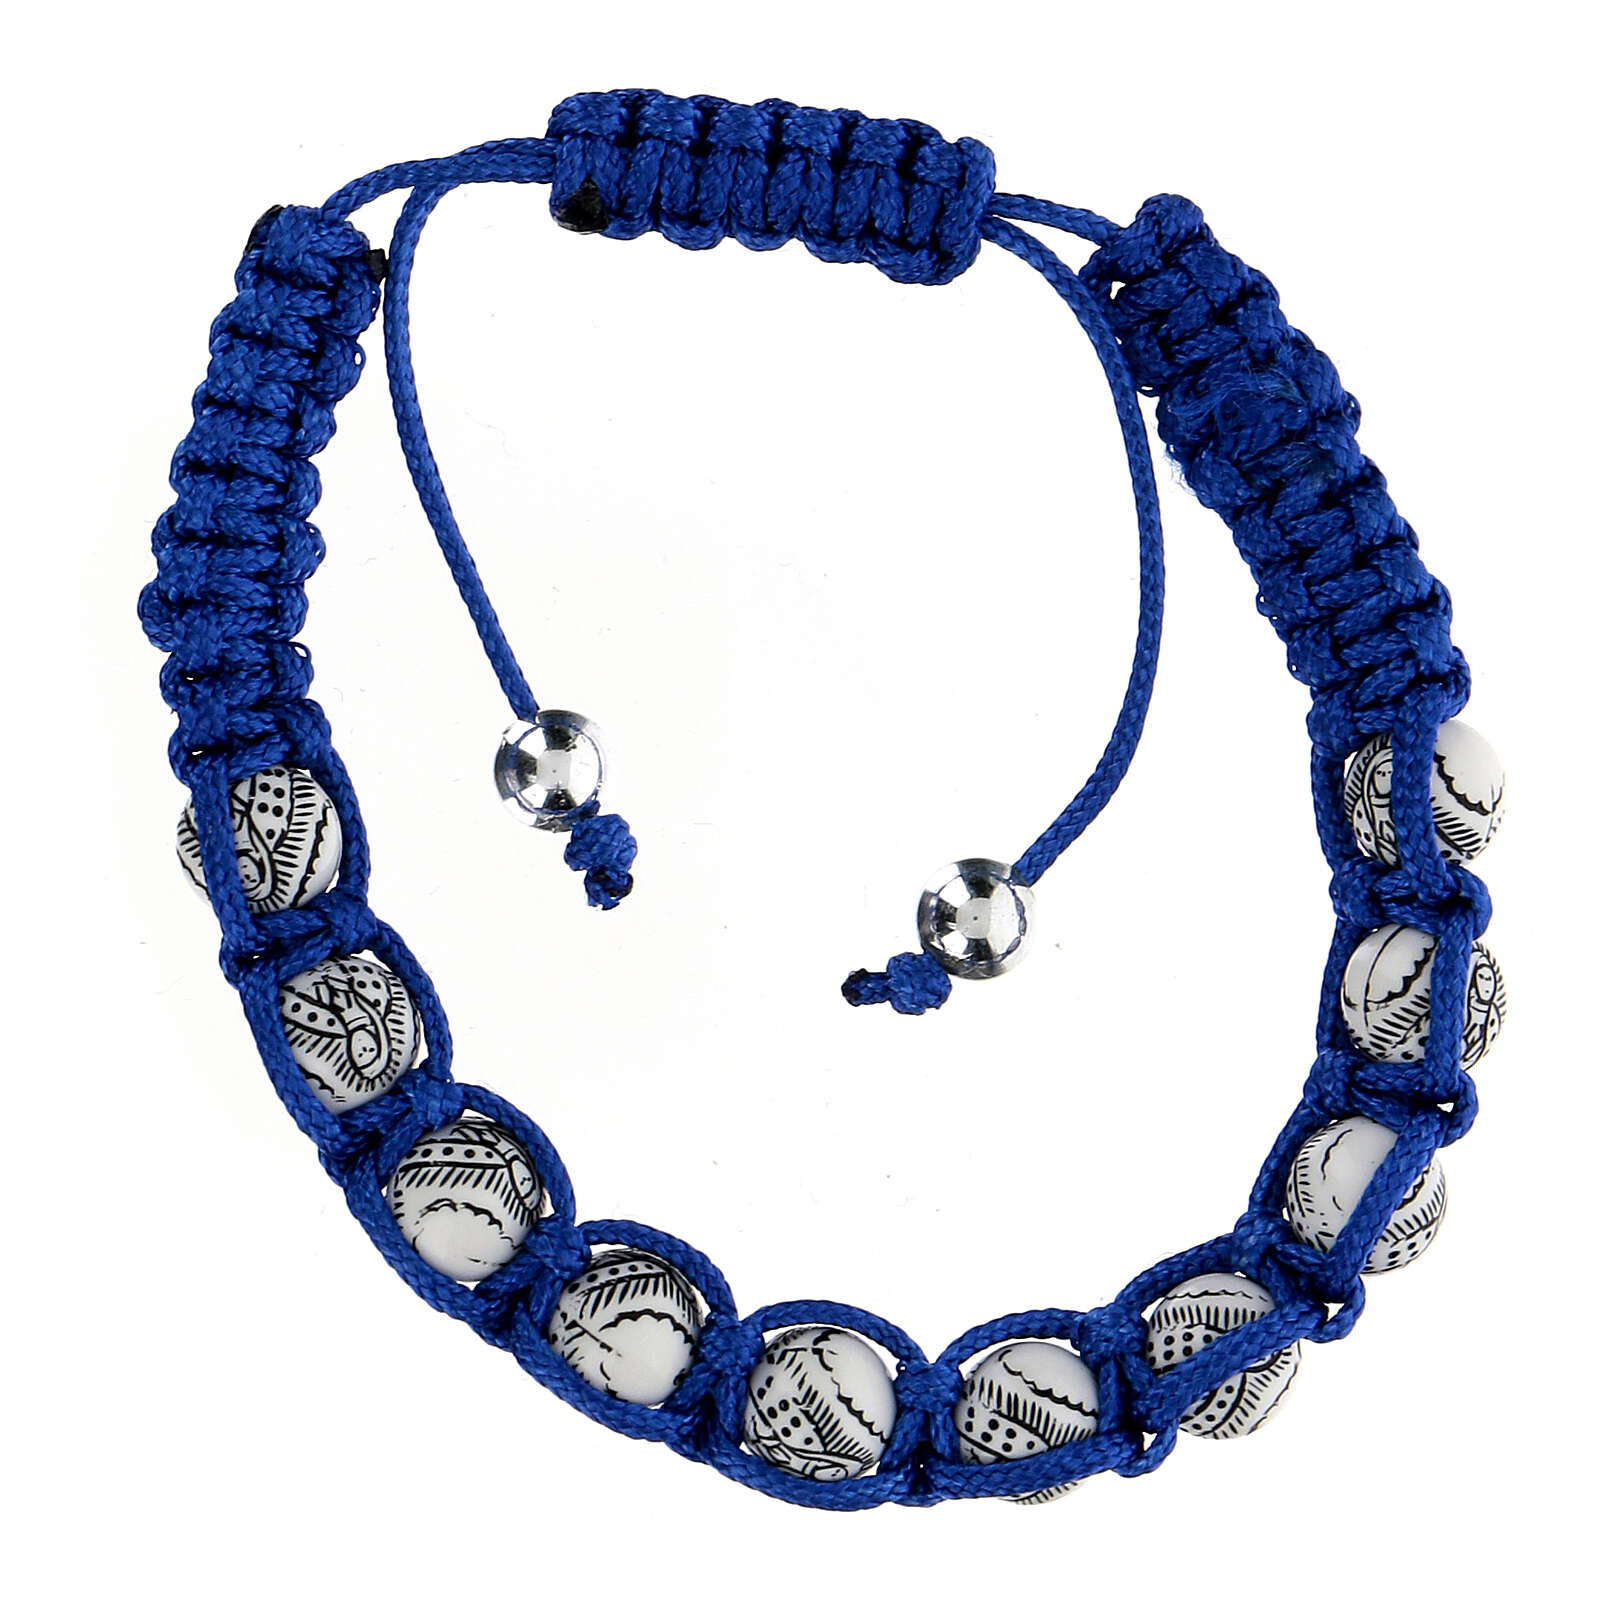 Pulseira dezena Nossa Senhora de Guadalupe corda azul 5 mm 4